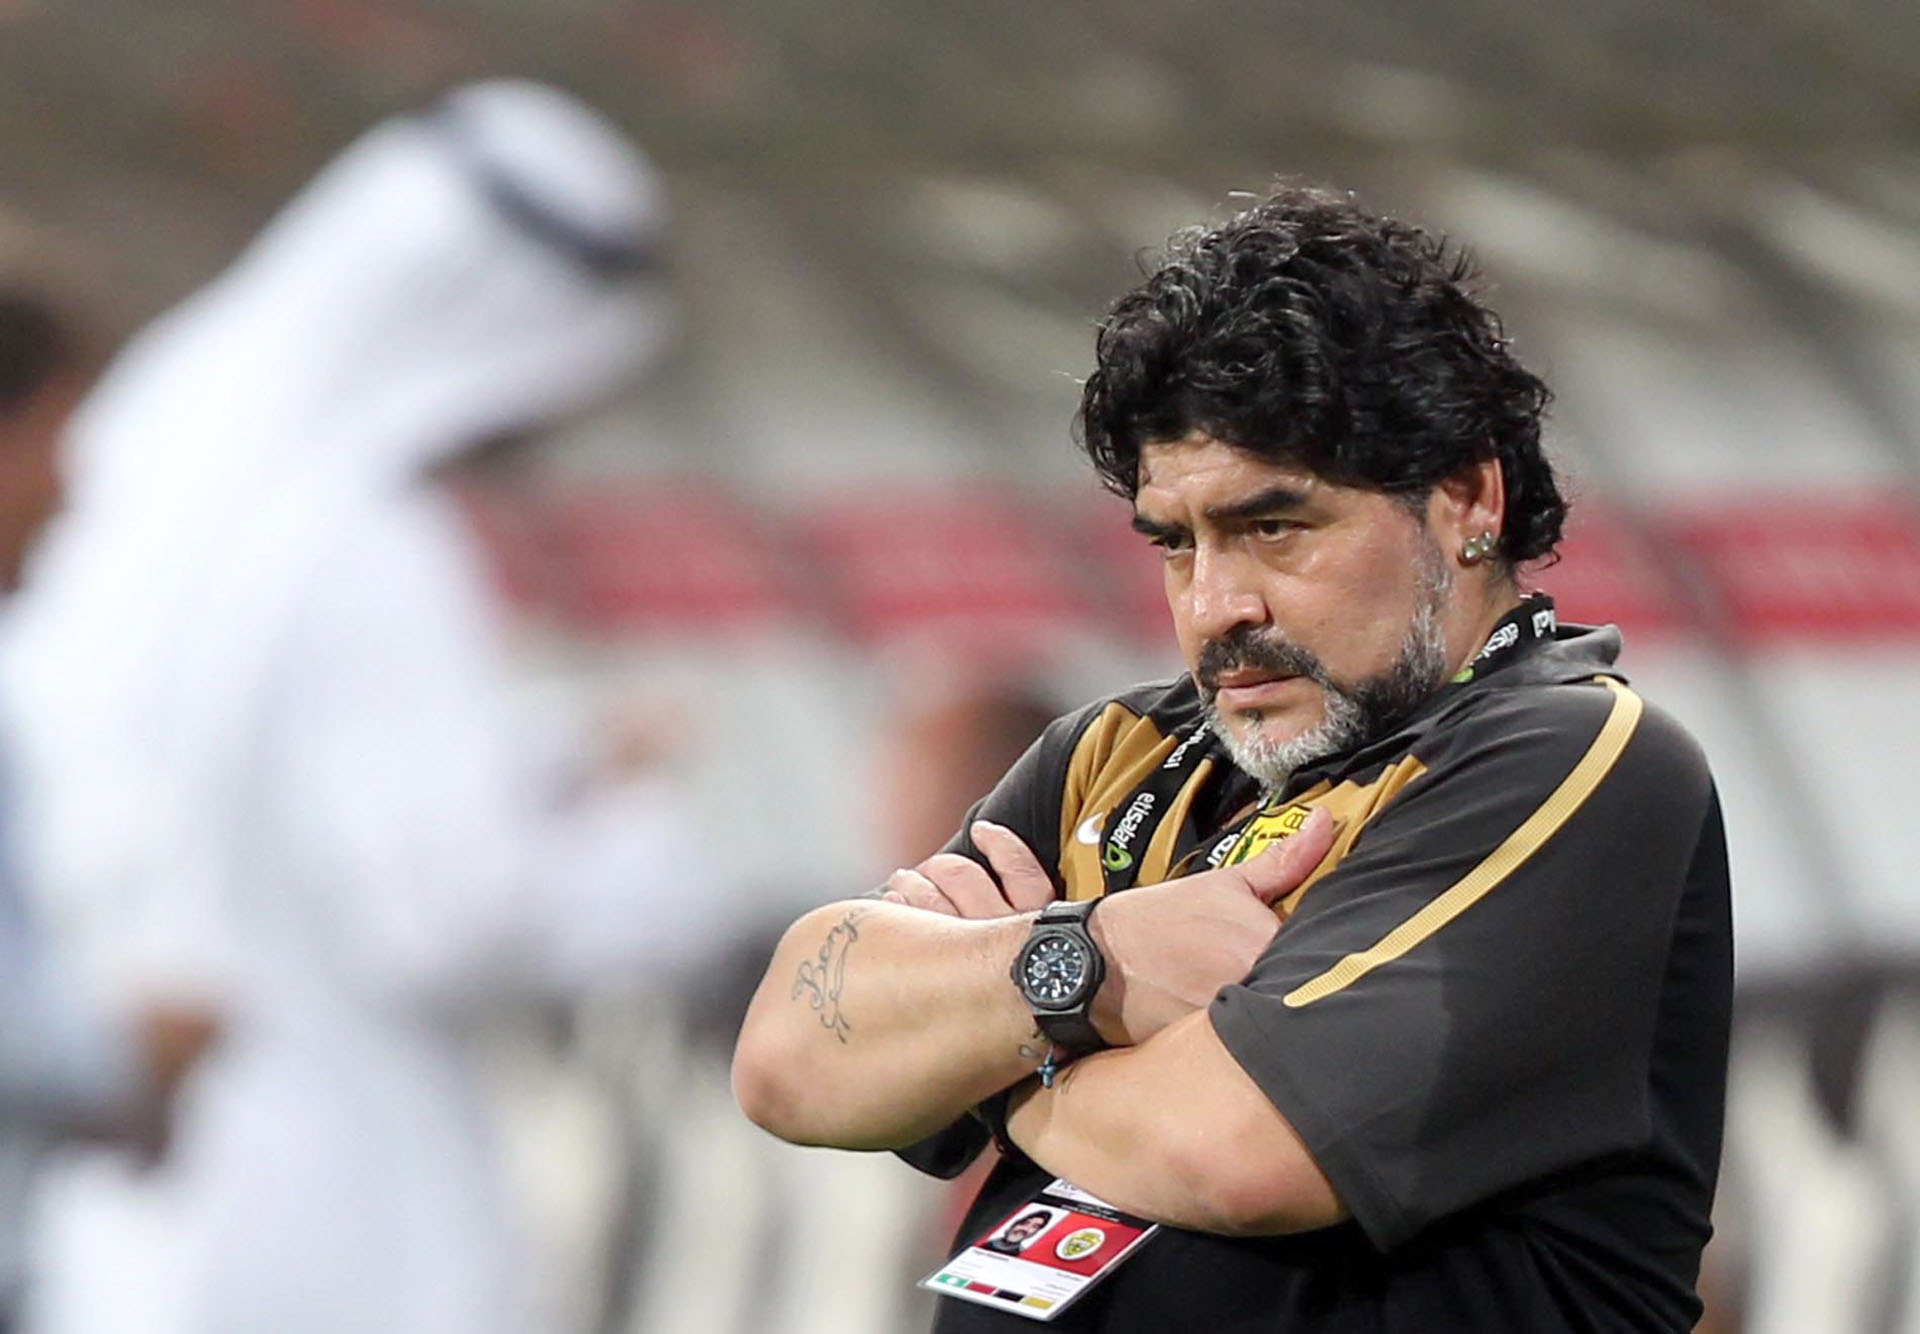 La AFA escuchara a Maradona?